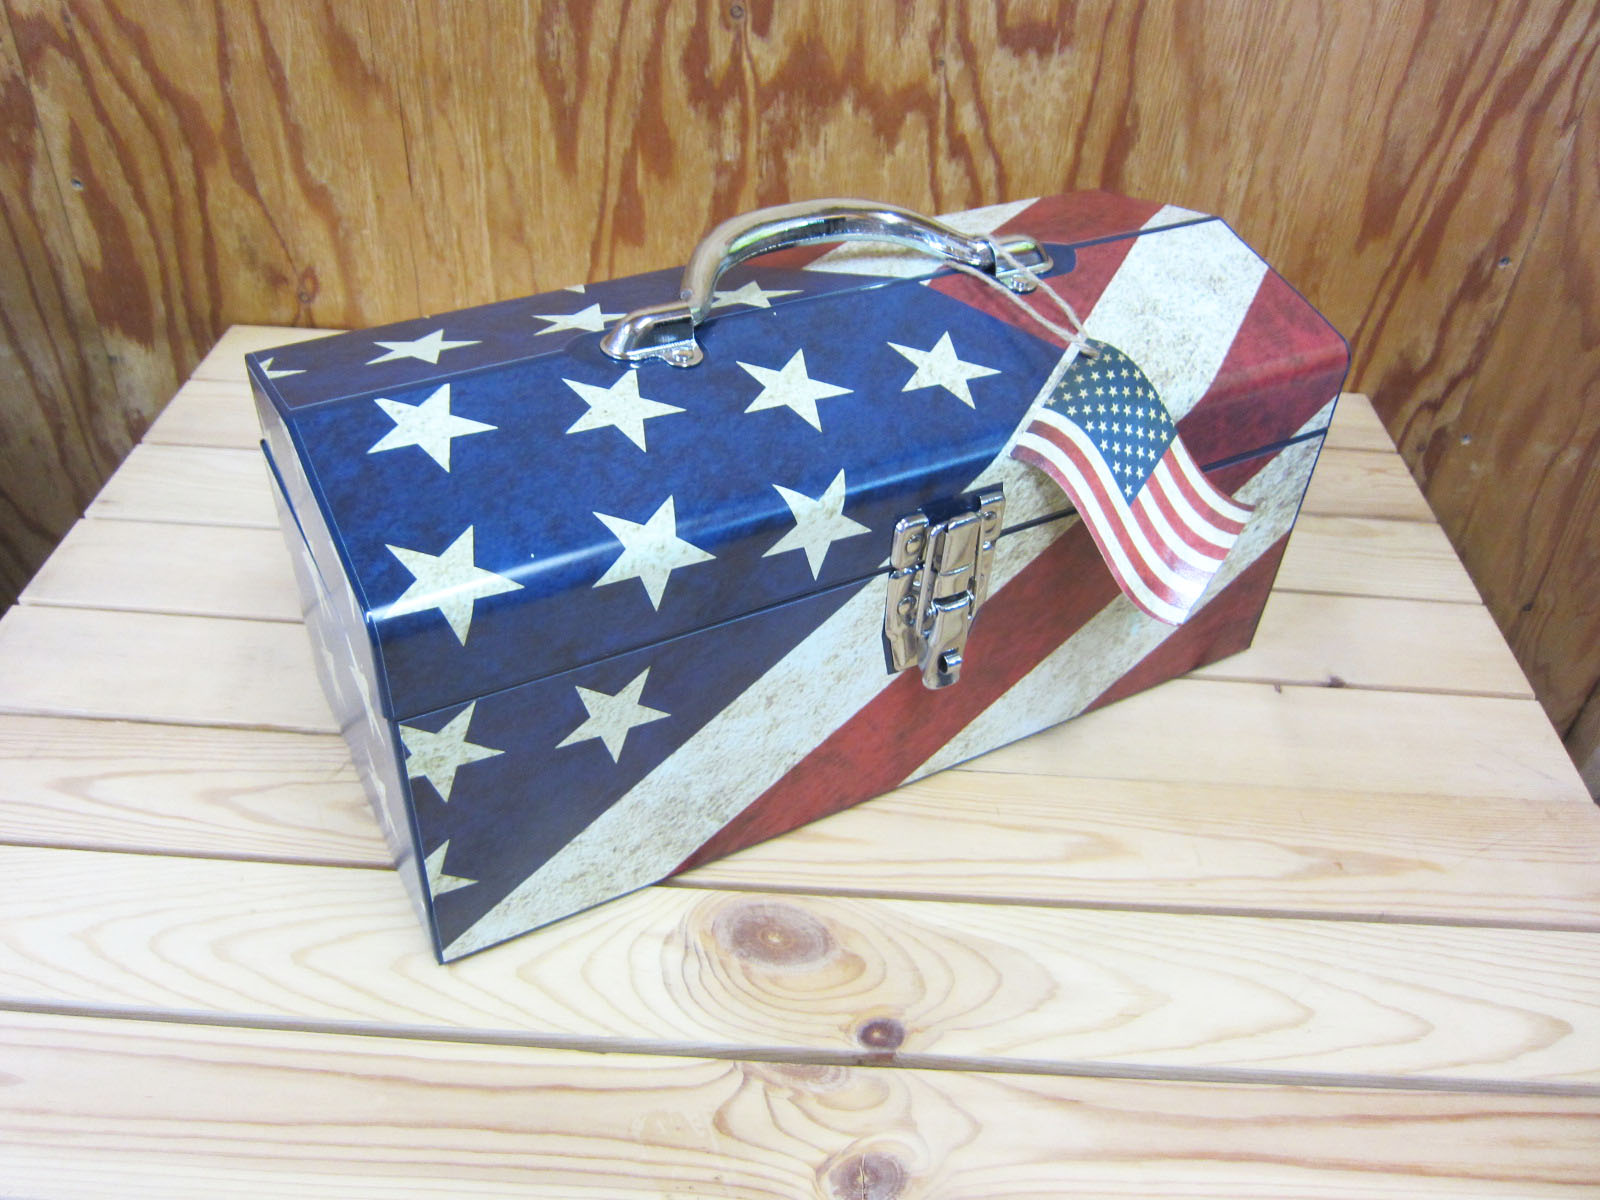 USA FLAG TOOL BOX★アメリカ国旗柄工具箱